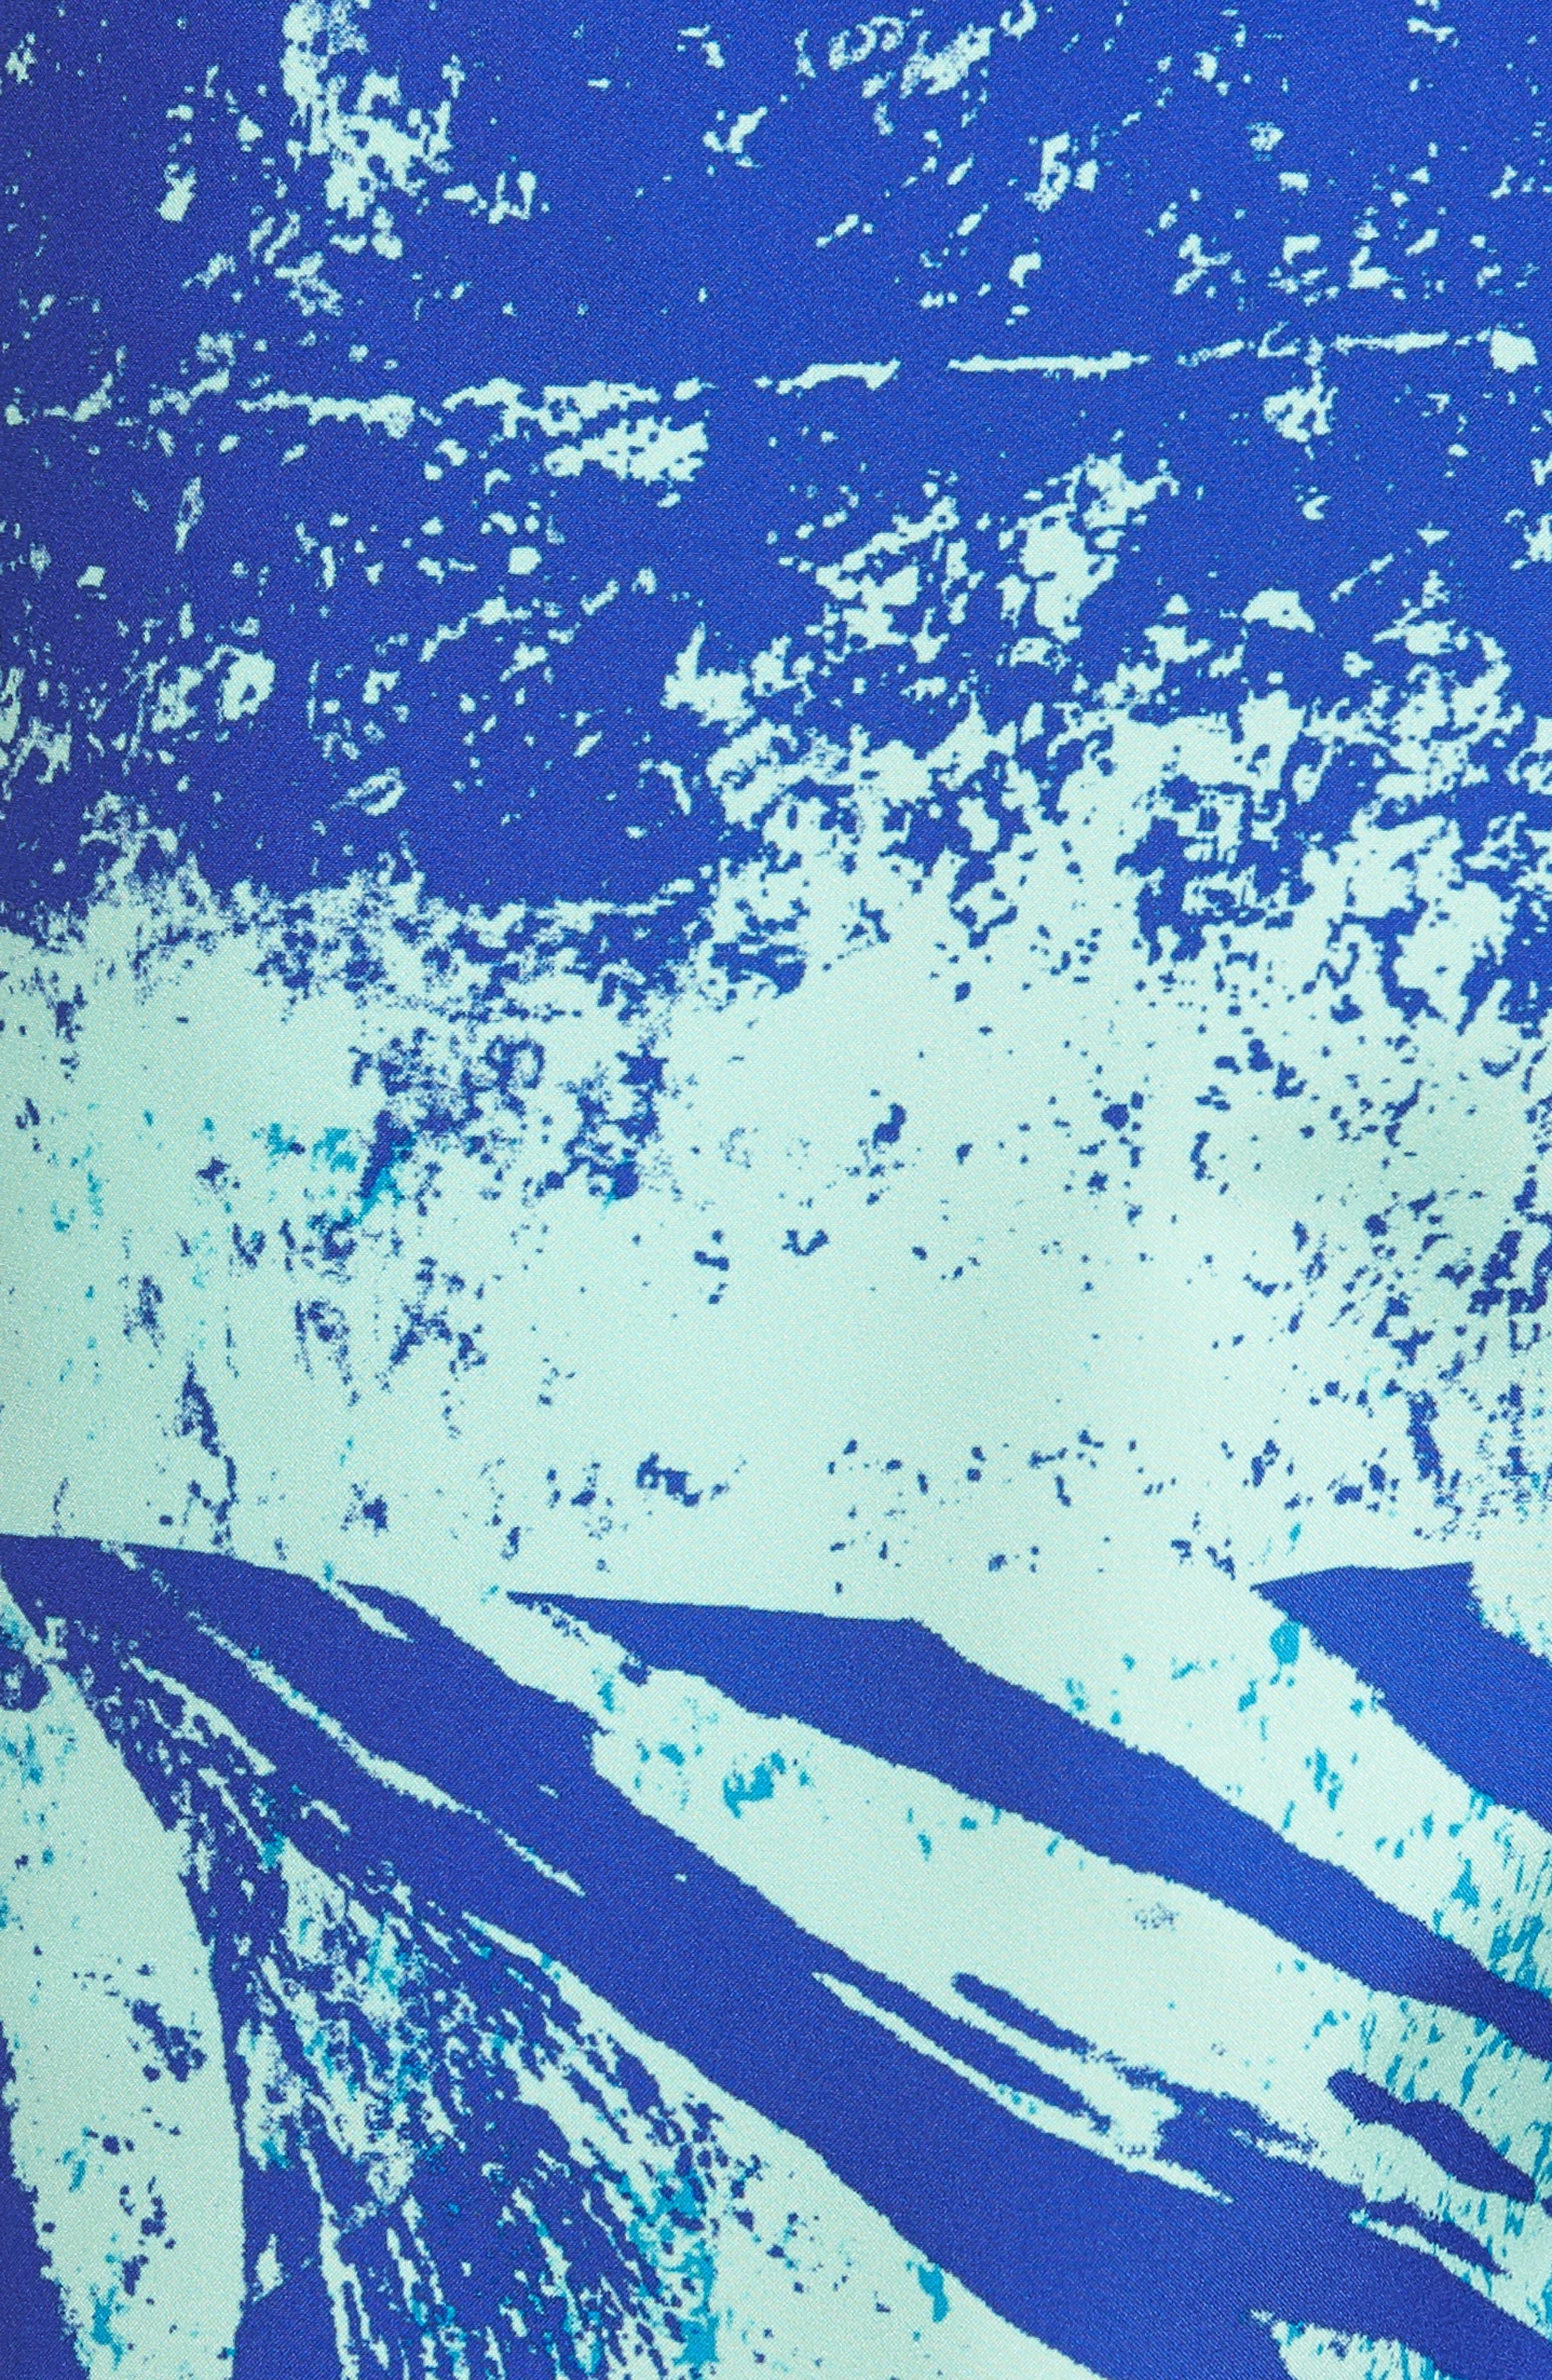 Banzai 9-Inch Swim Trunks,                             Alternate thumbnail 5, color,                             Screen Print Wave